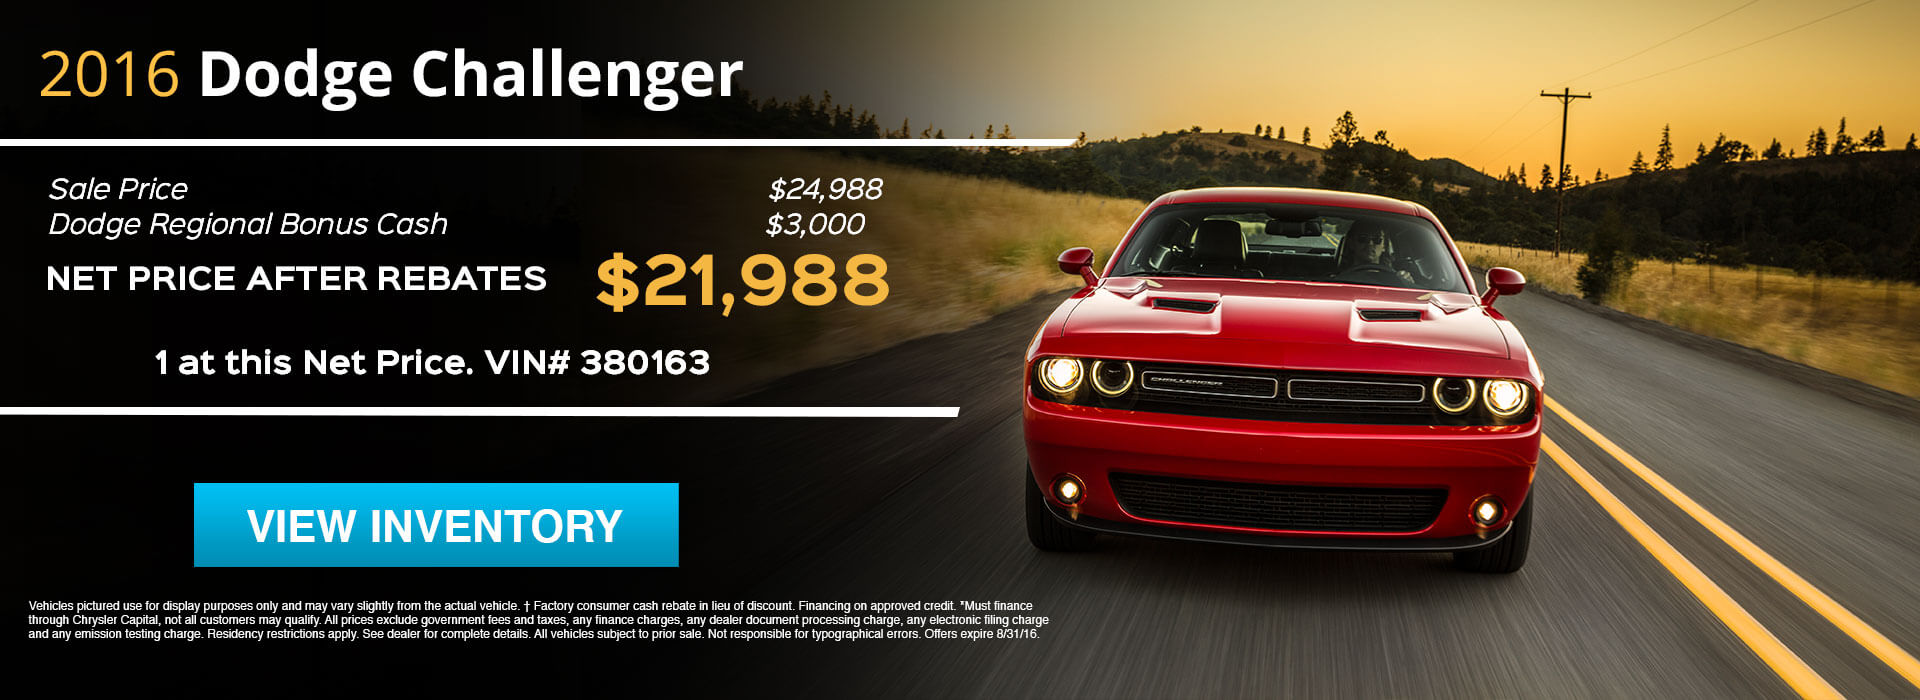 2016 Dodge Challenger HP